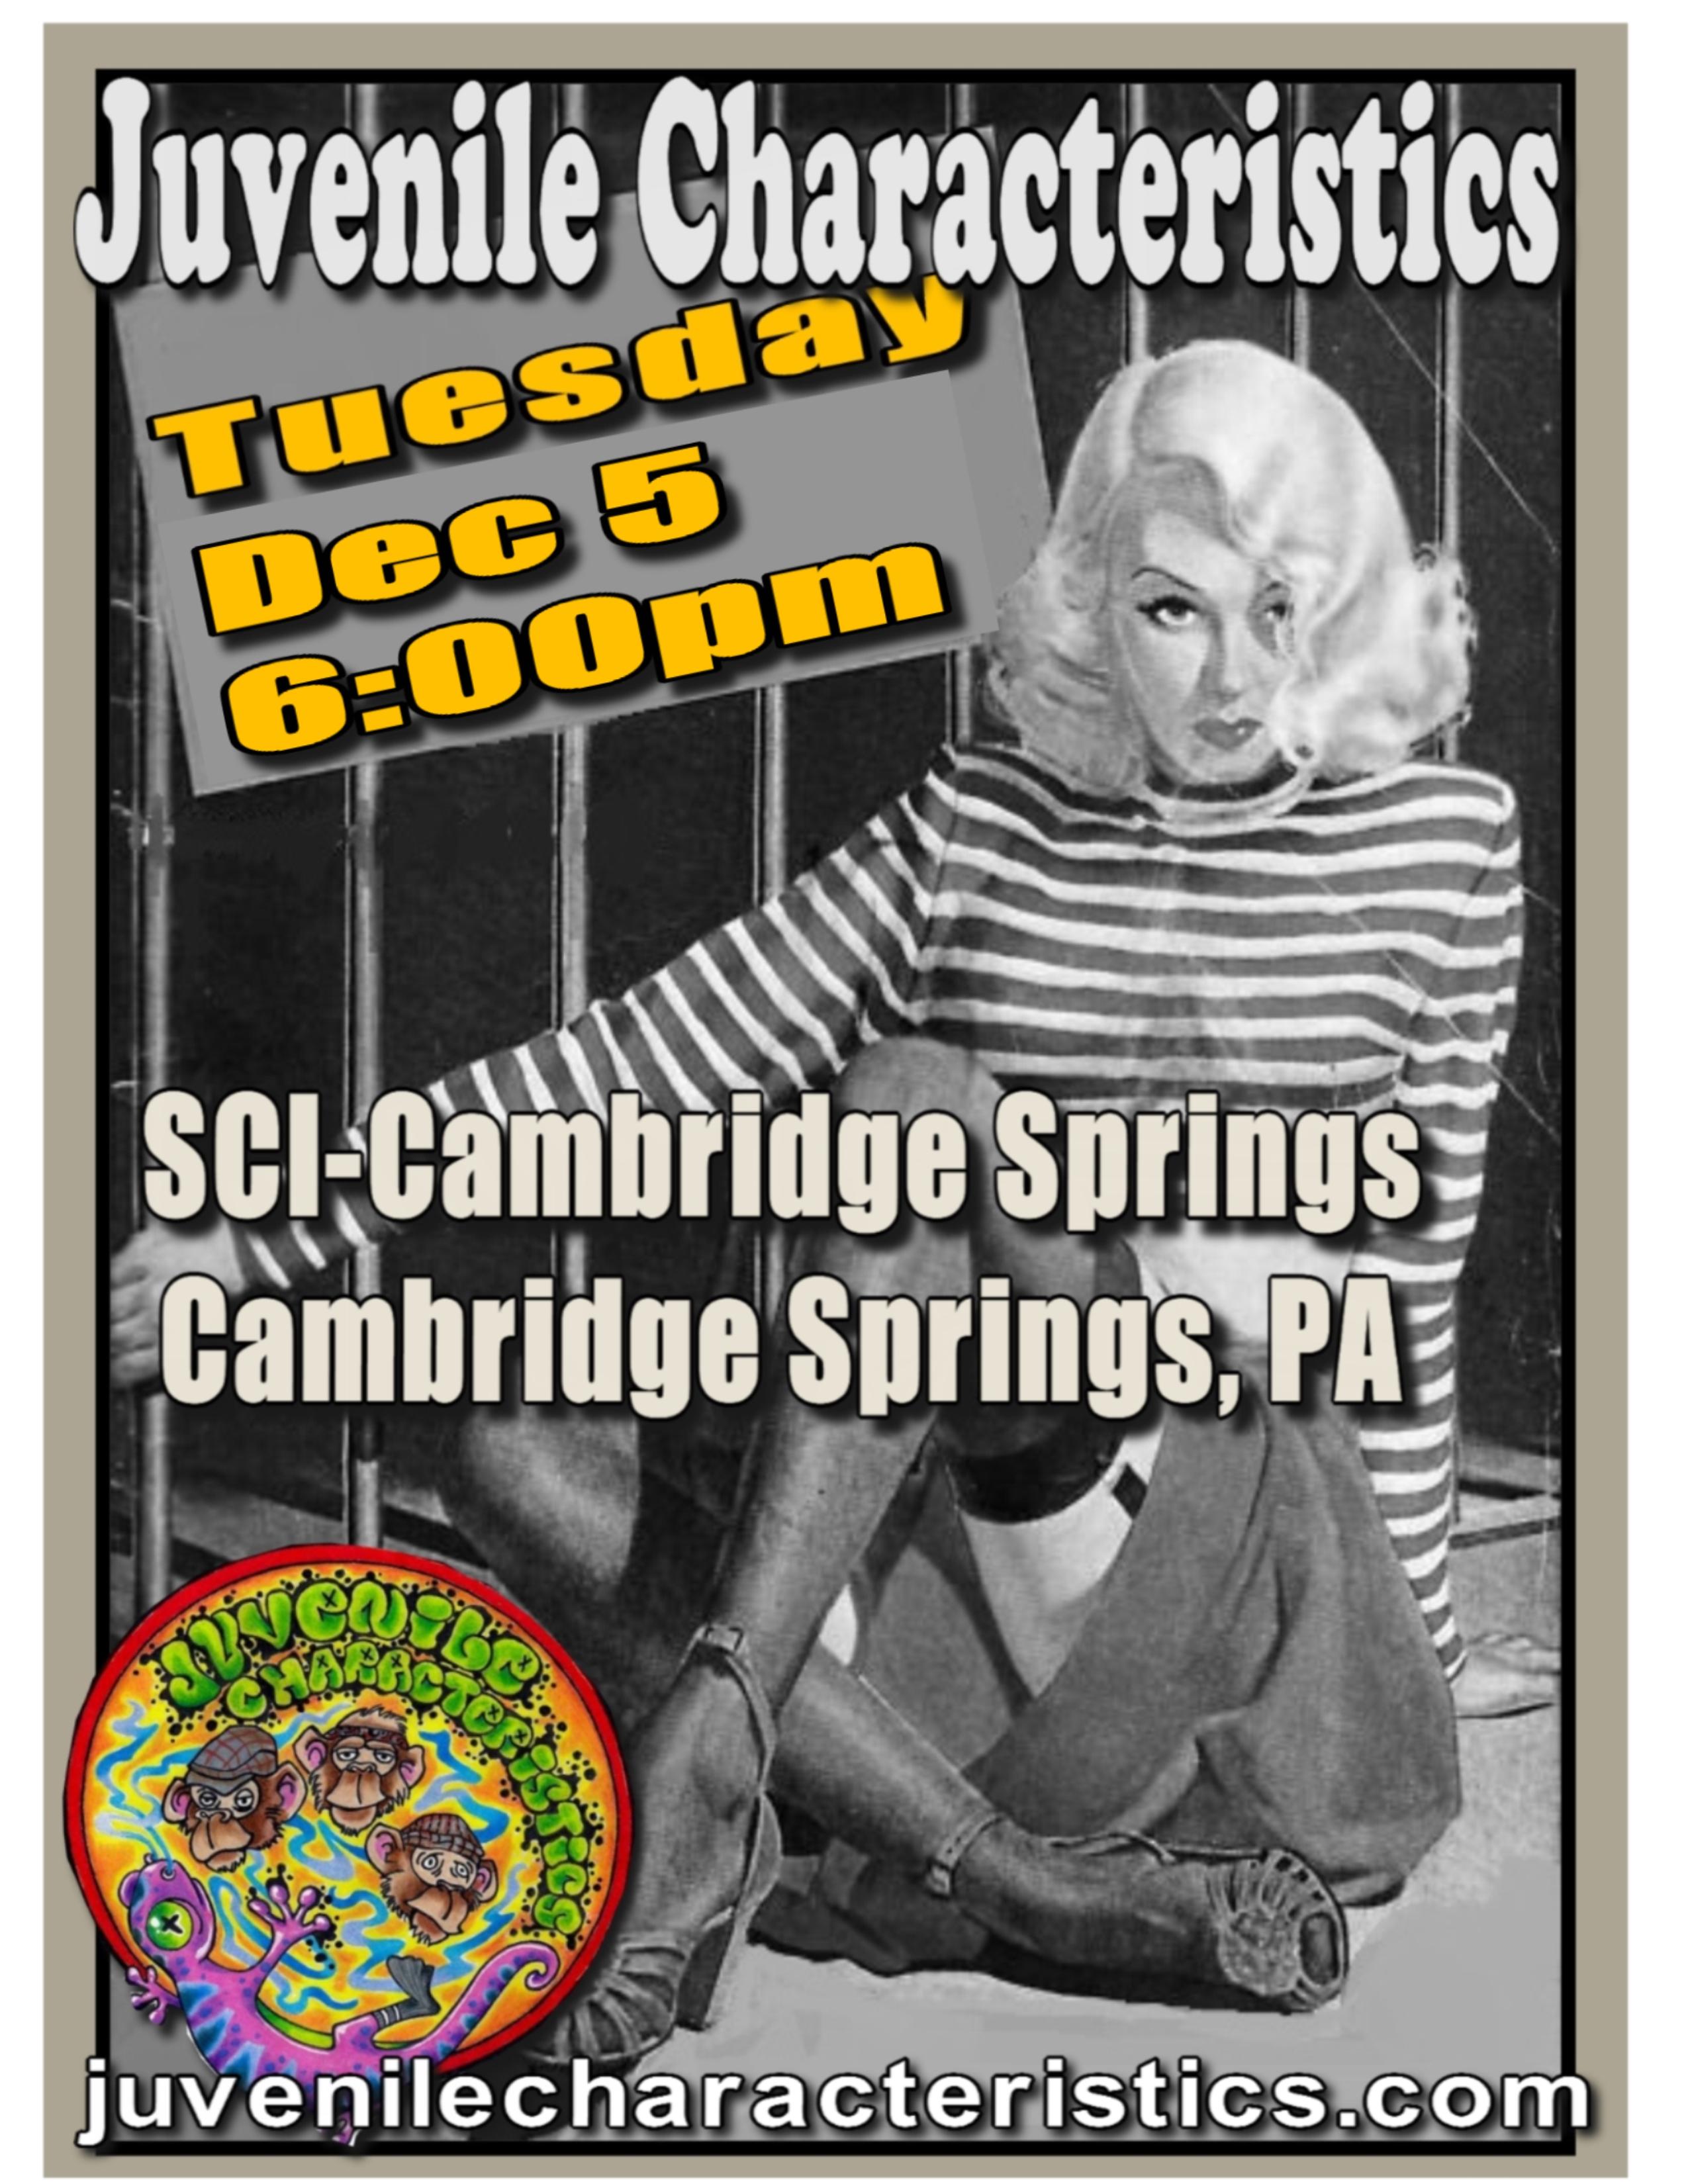 SCI-Cambridge Springs 12/5/17